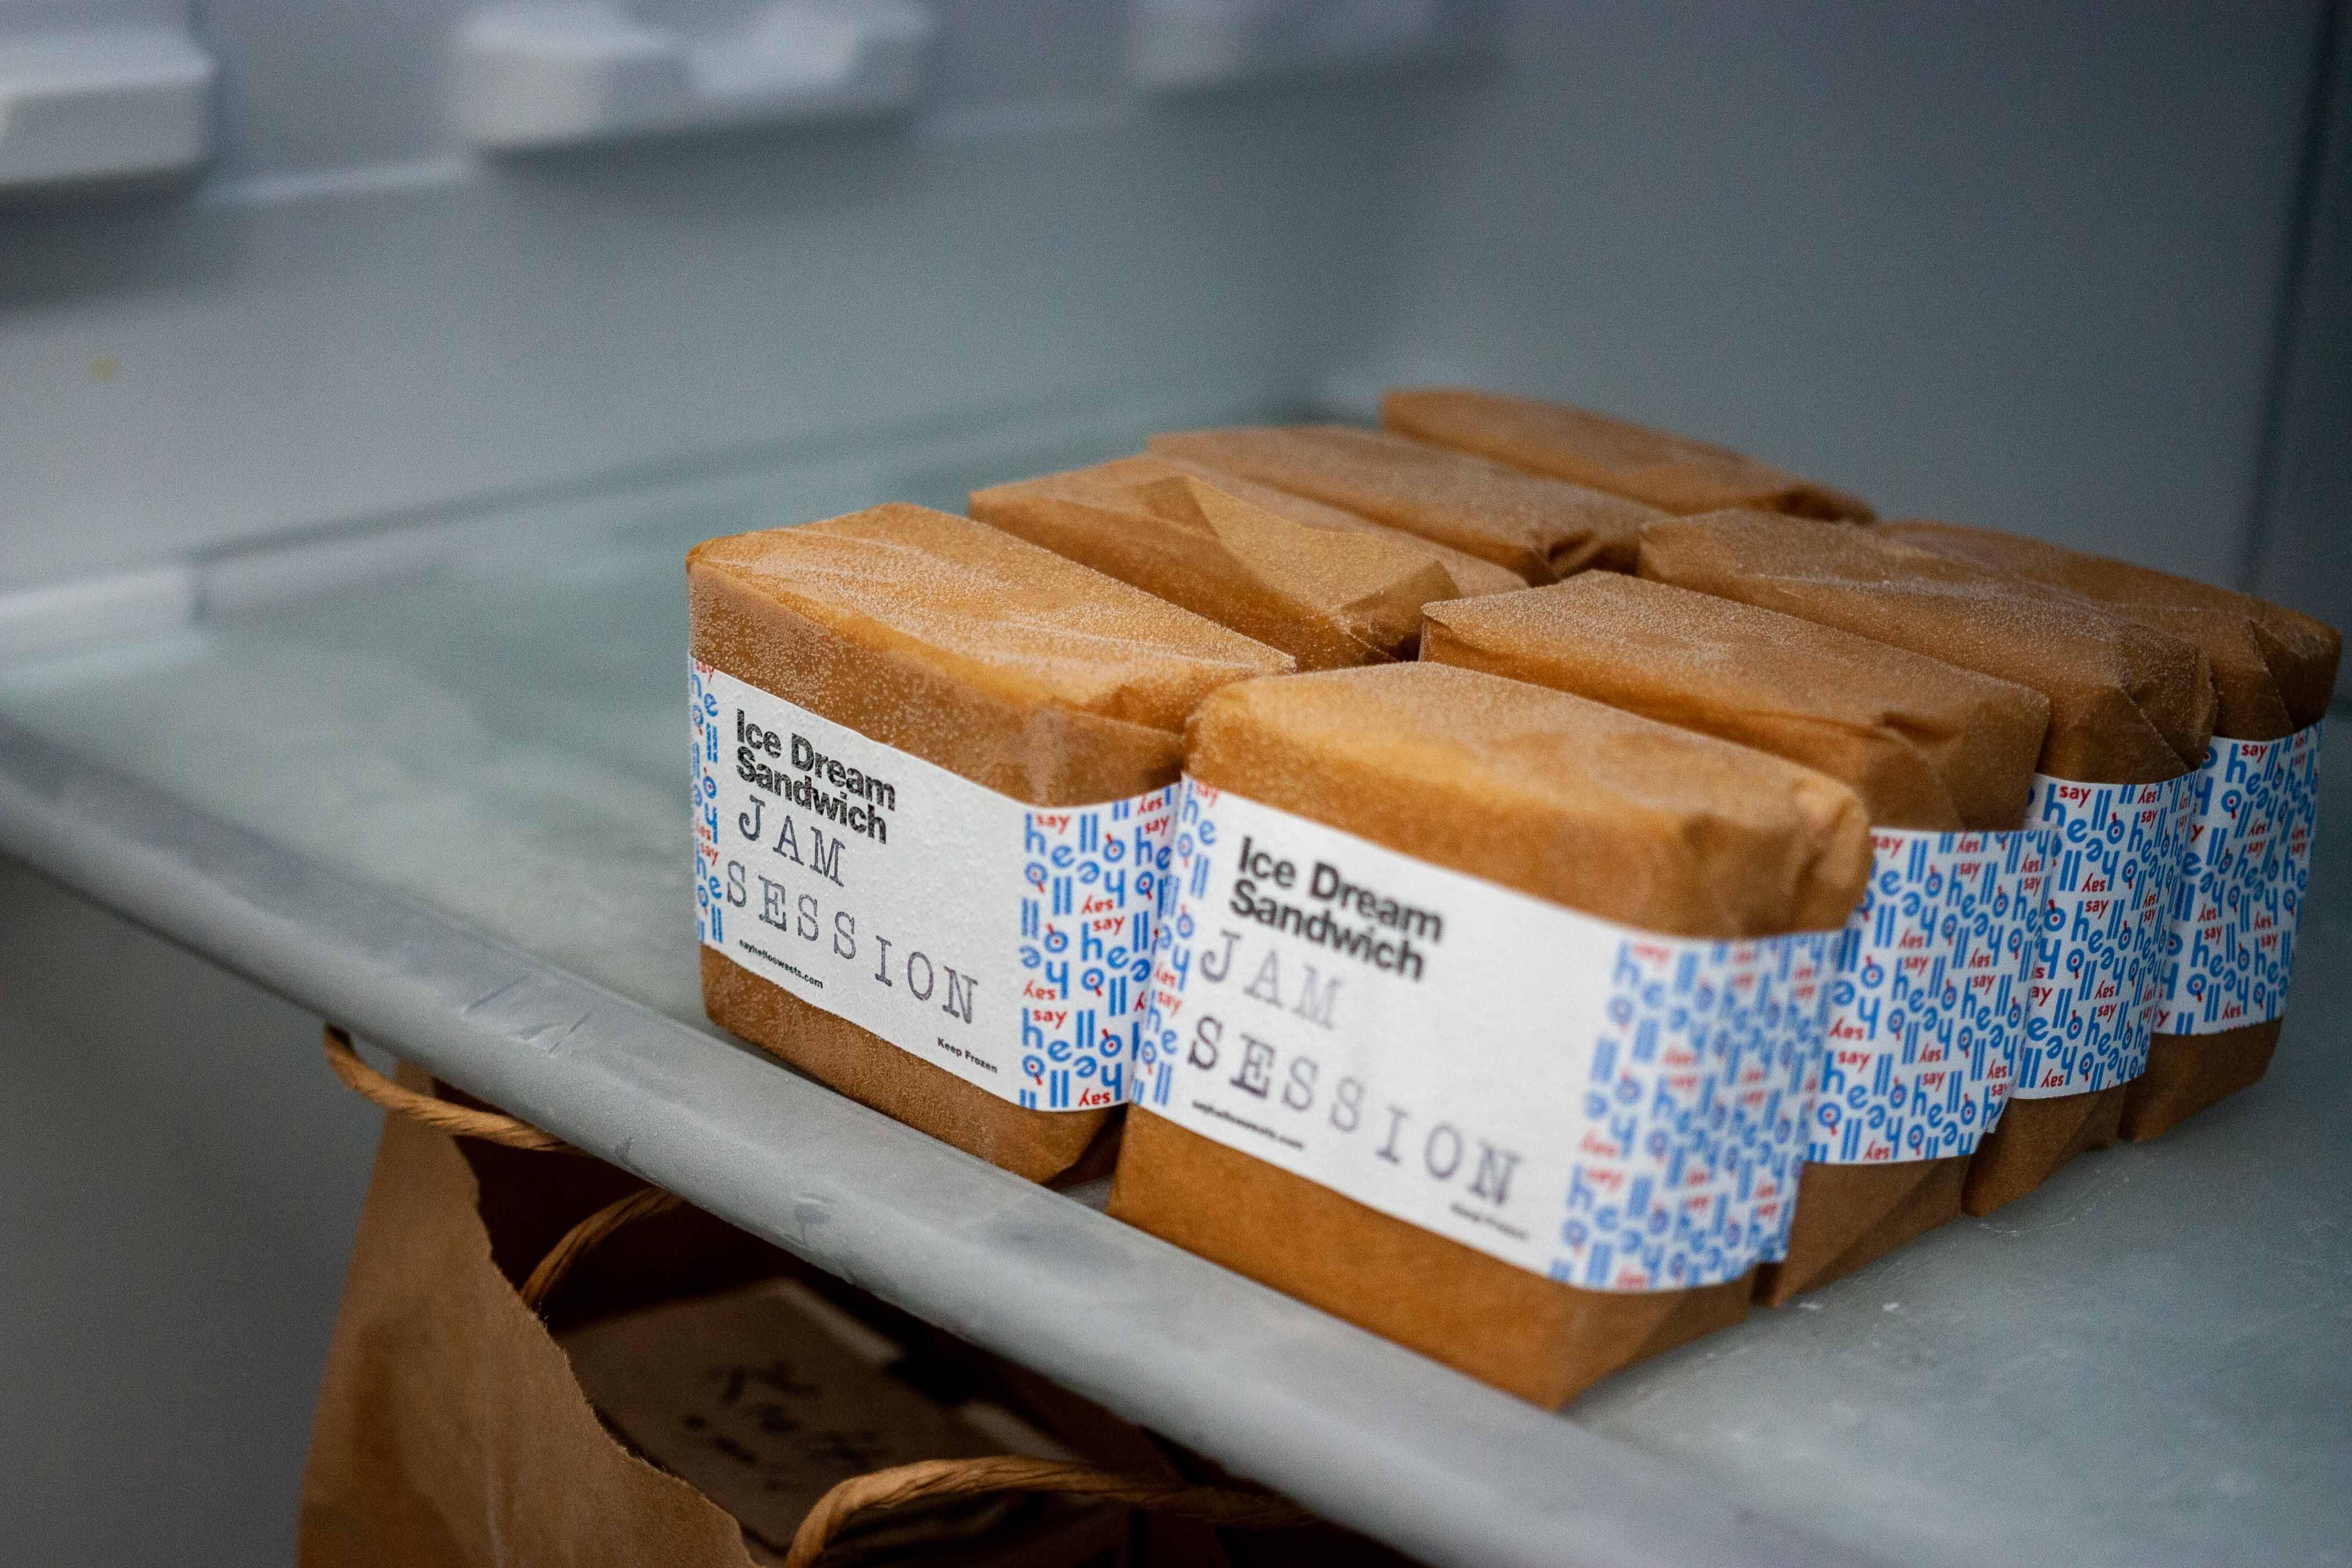 Say Hello Ice Cream Sandwiches inside a freezer — by Yagnyuk.